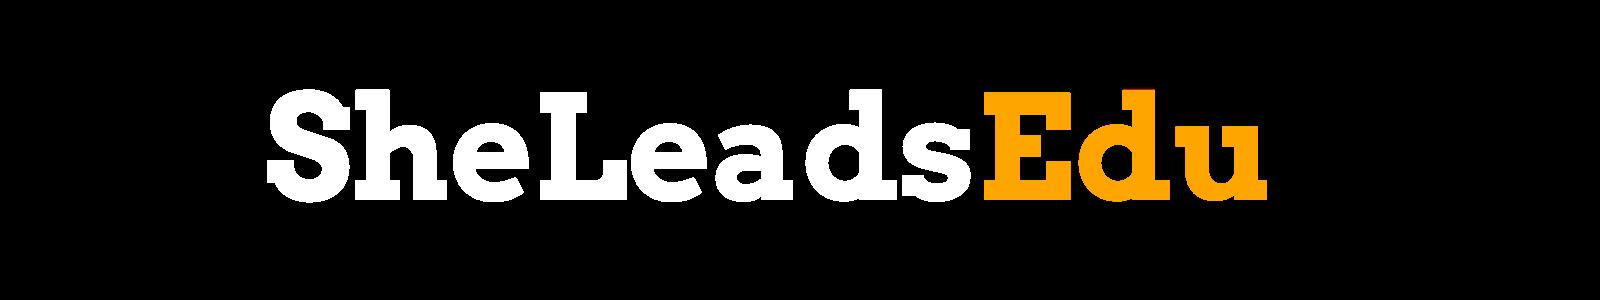 SheLeadsEdu